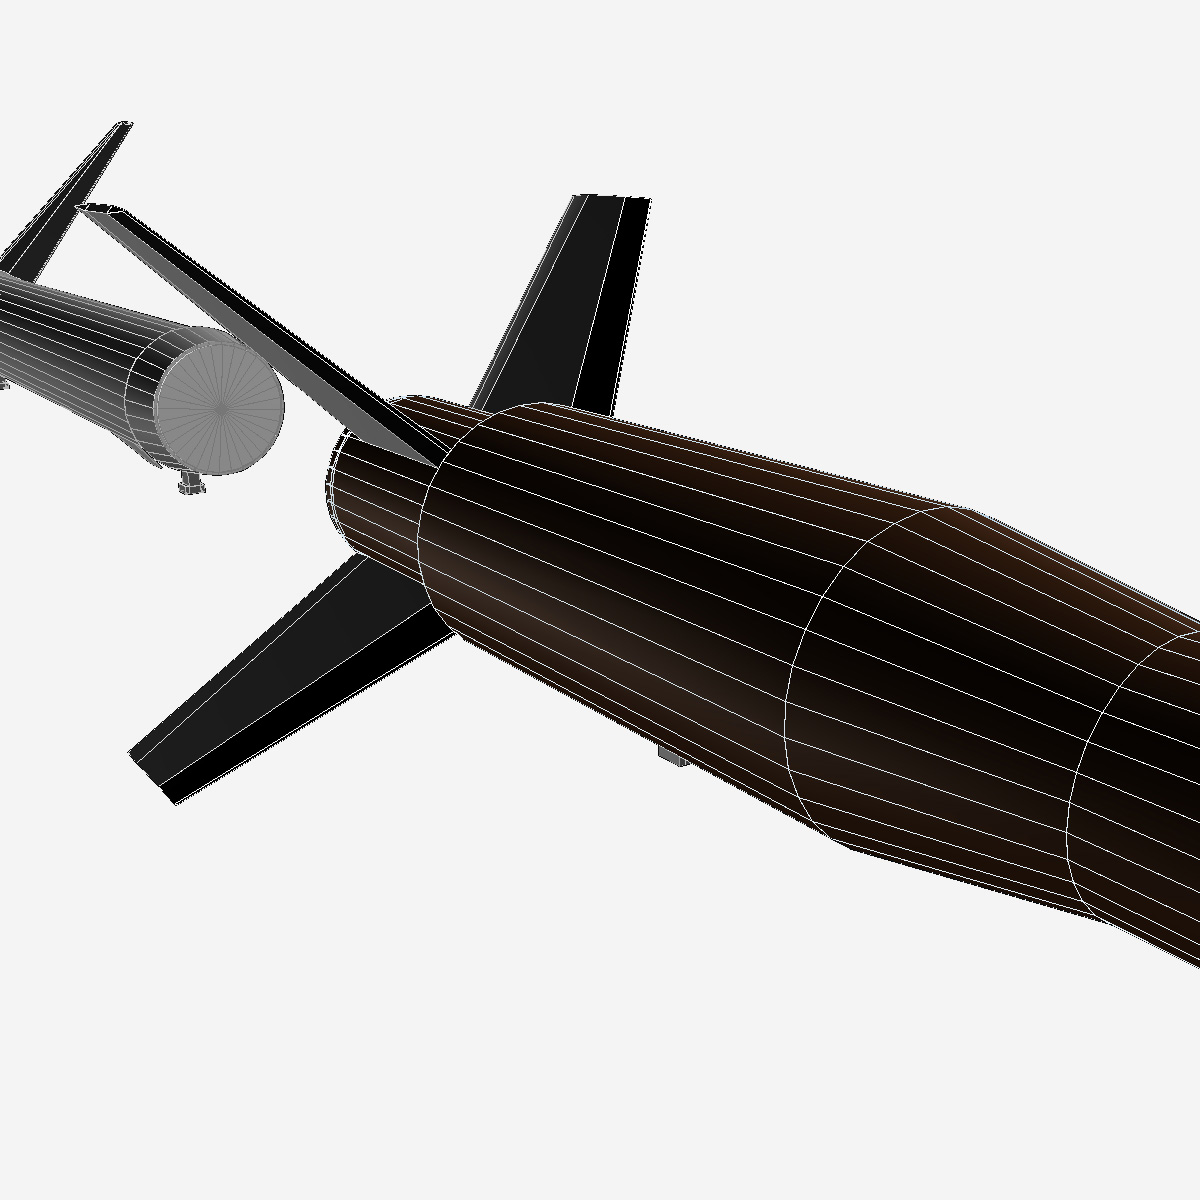 Astrobee 200 Rocket 3d model 3ds dxf fbx blend cob dae X   obj 165960